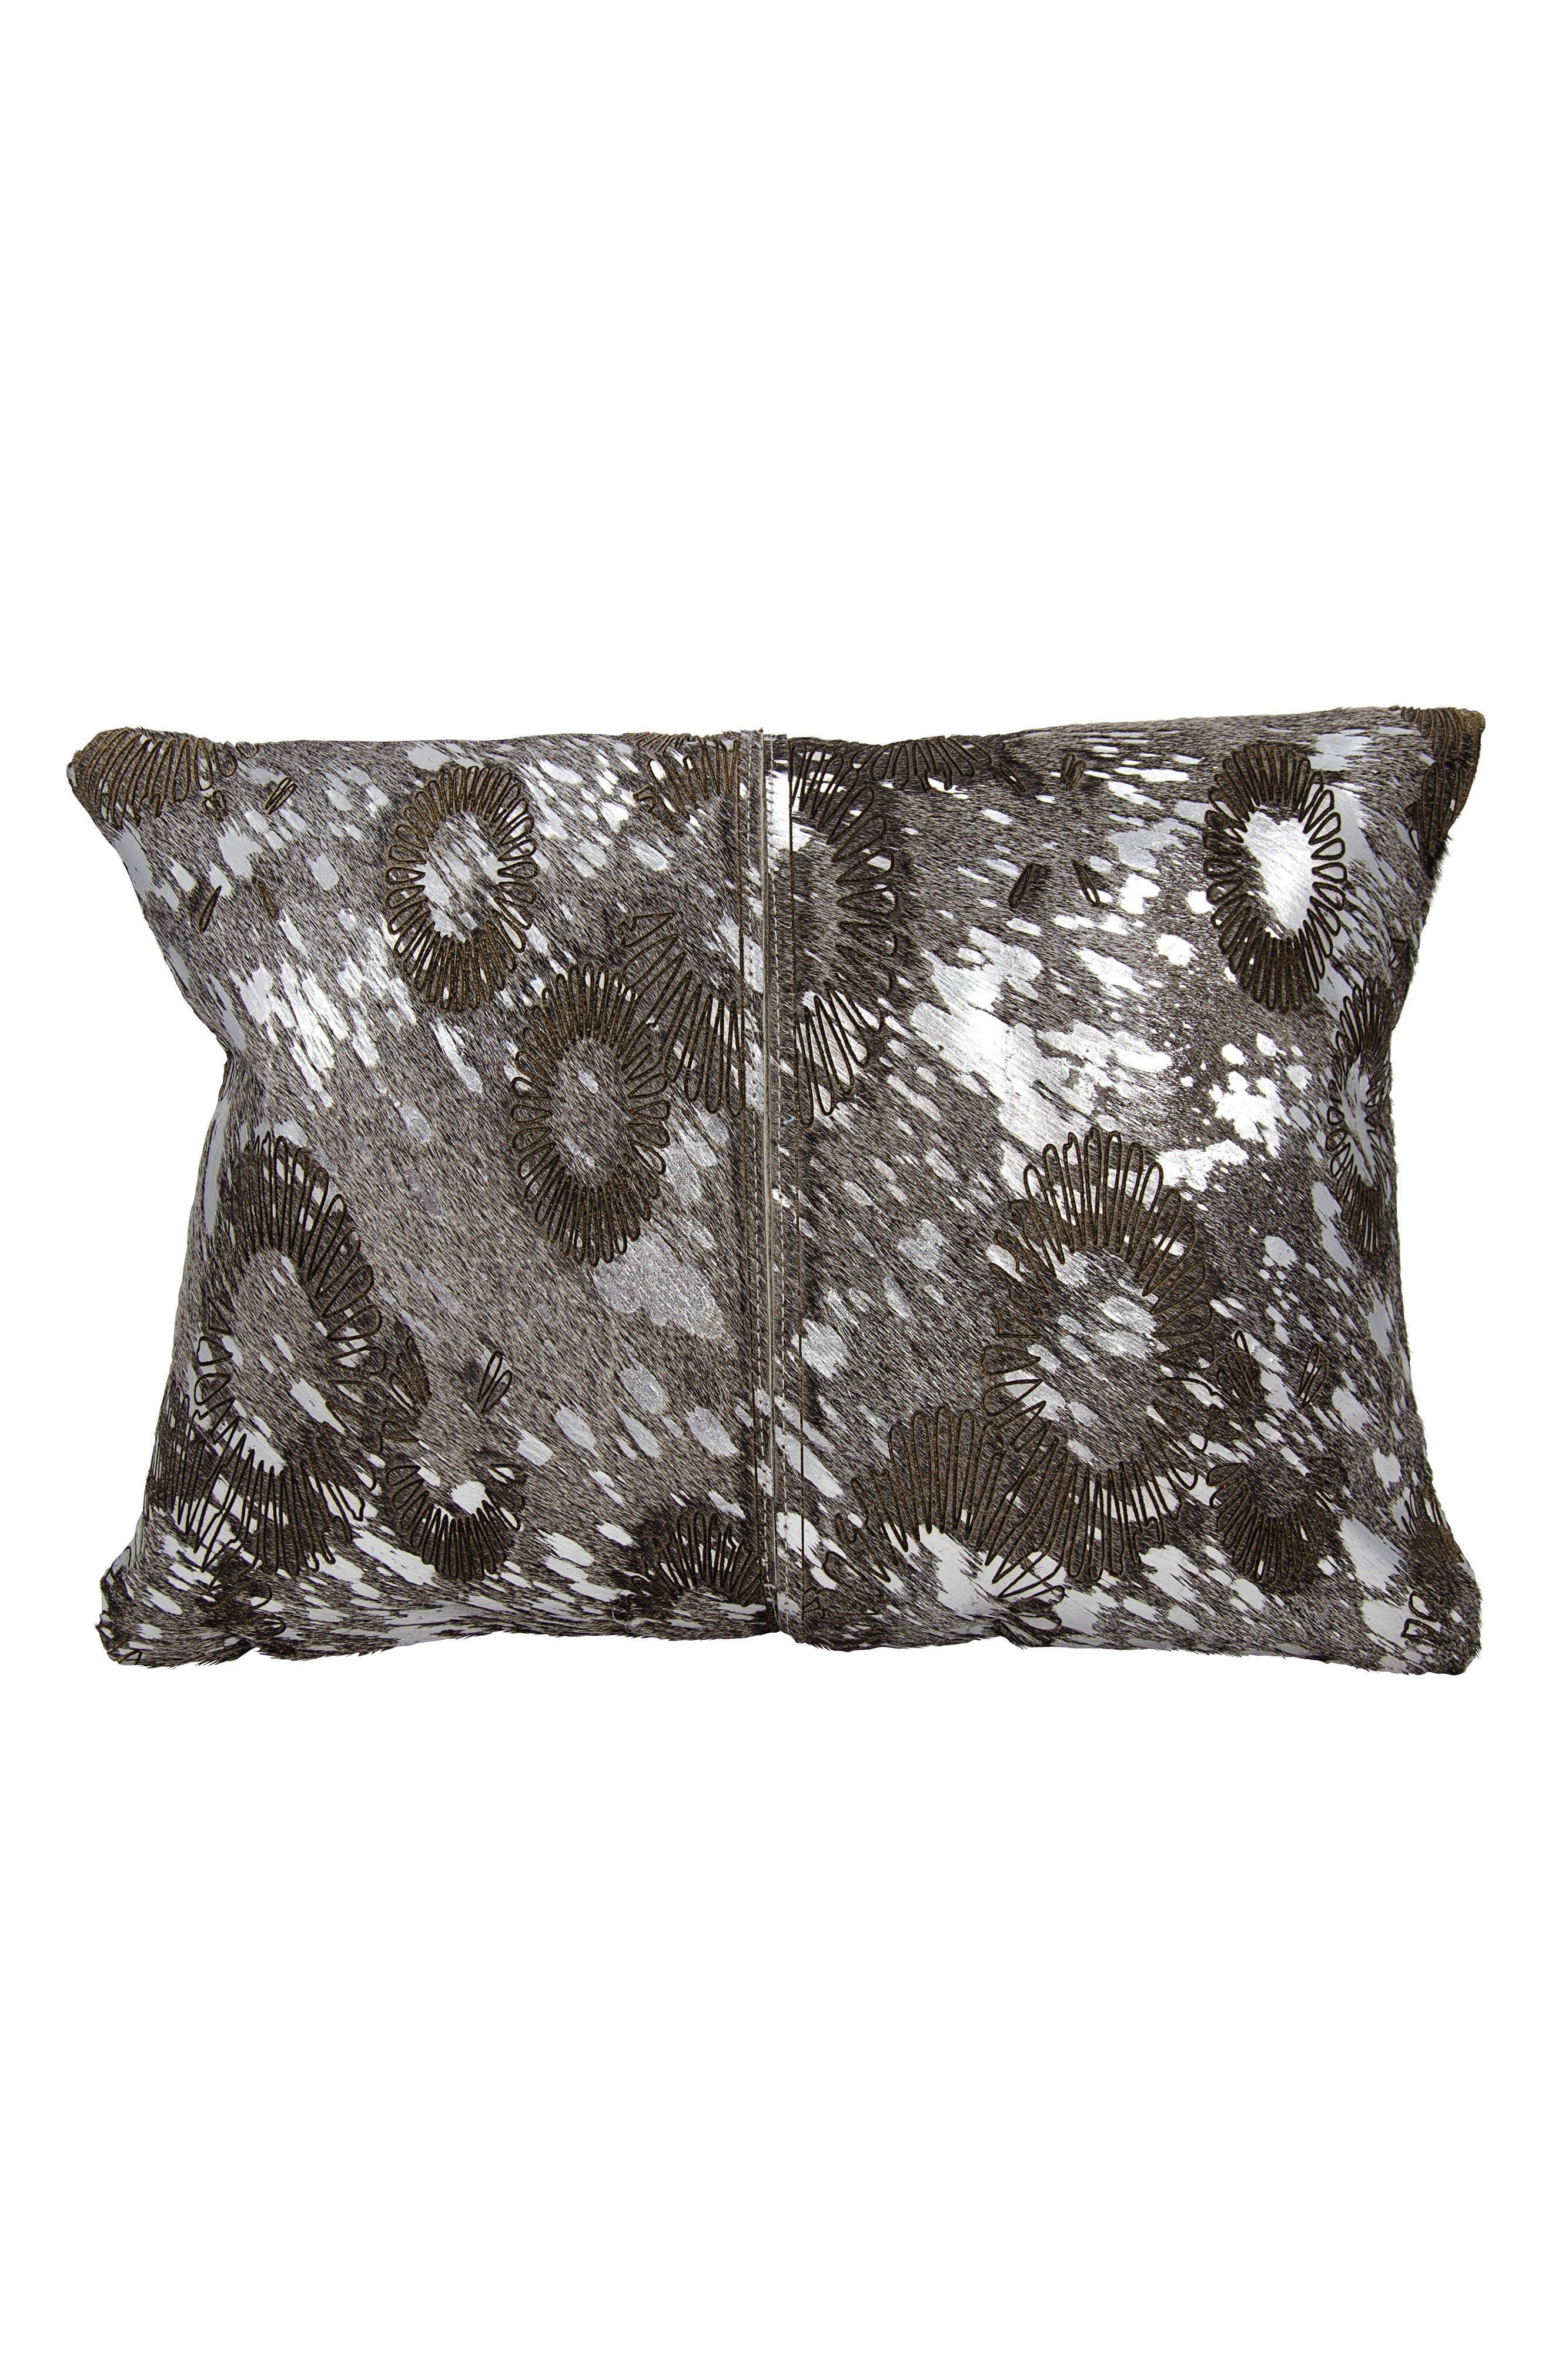 Main Image - Mina Victory Metallic Calf Hair Accent Pillow